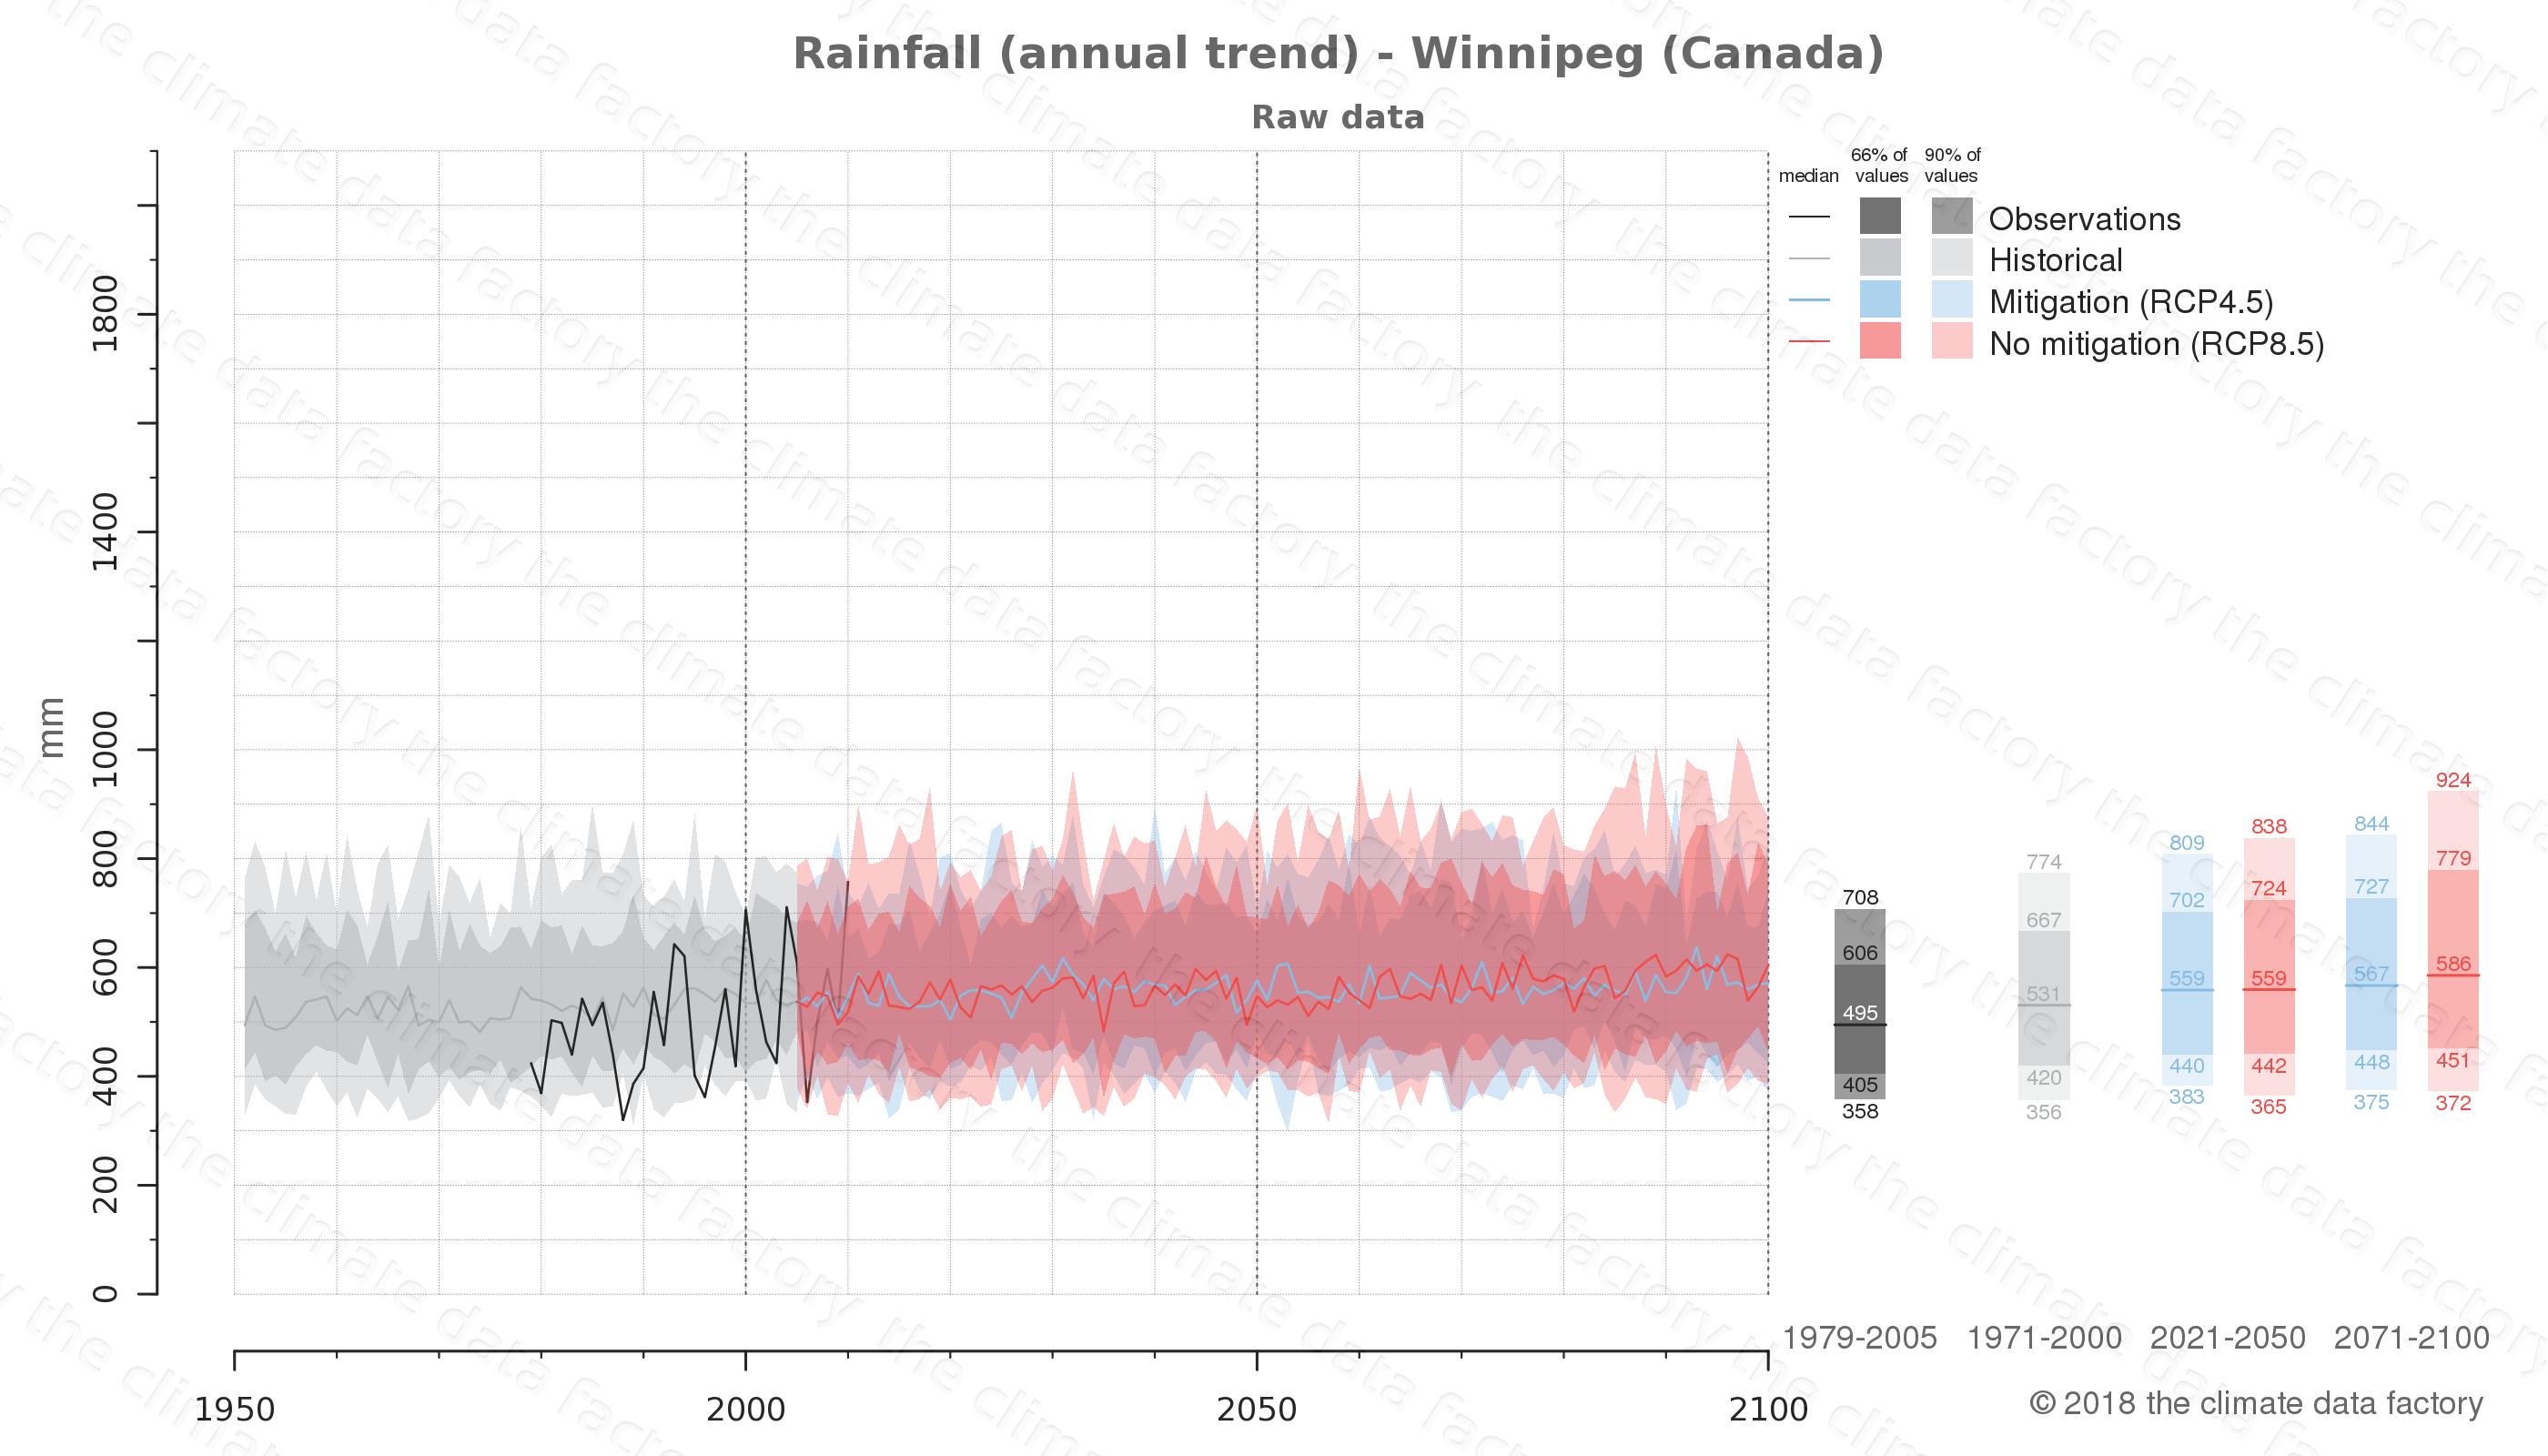 climate change data policy adaptation climate graph city data rainfall winnipeg canada